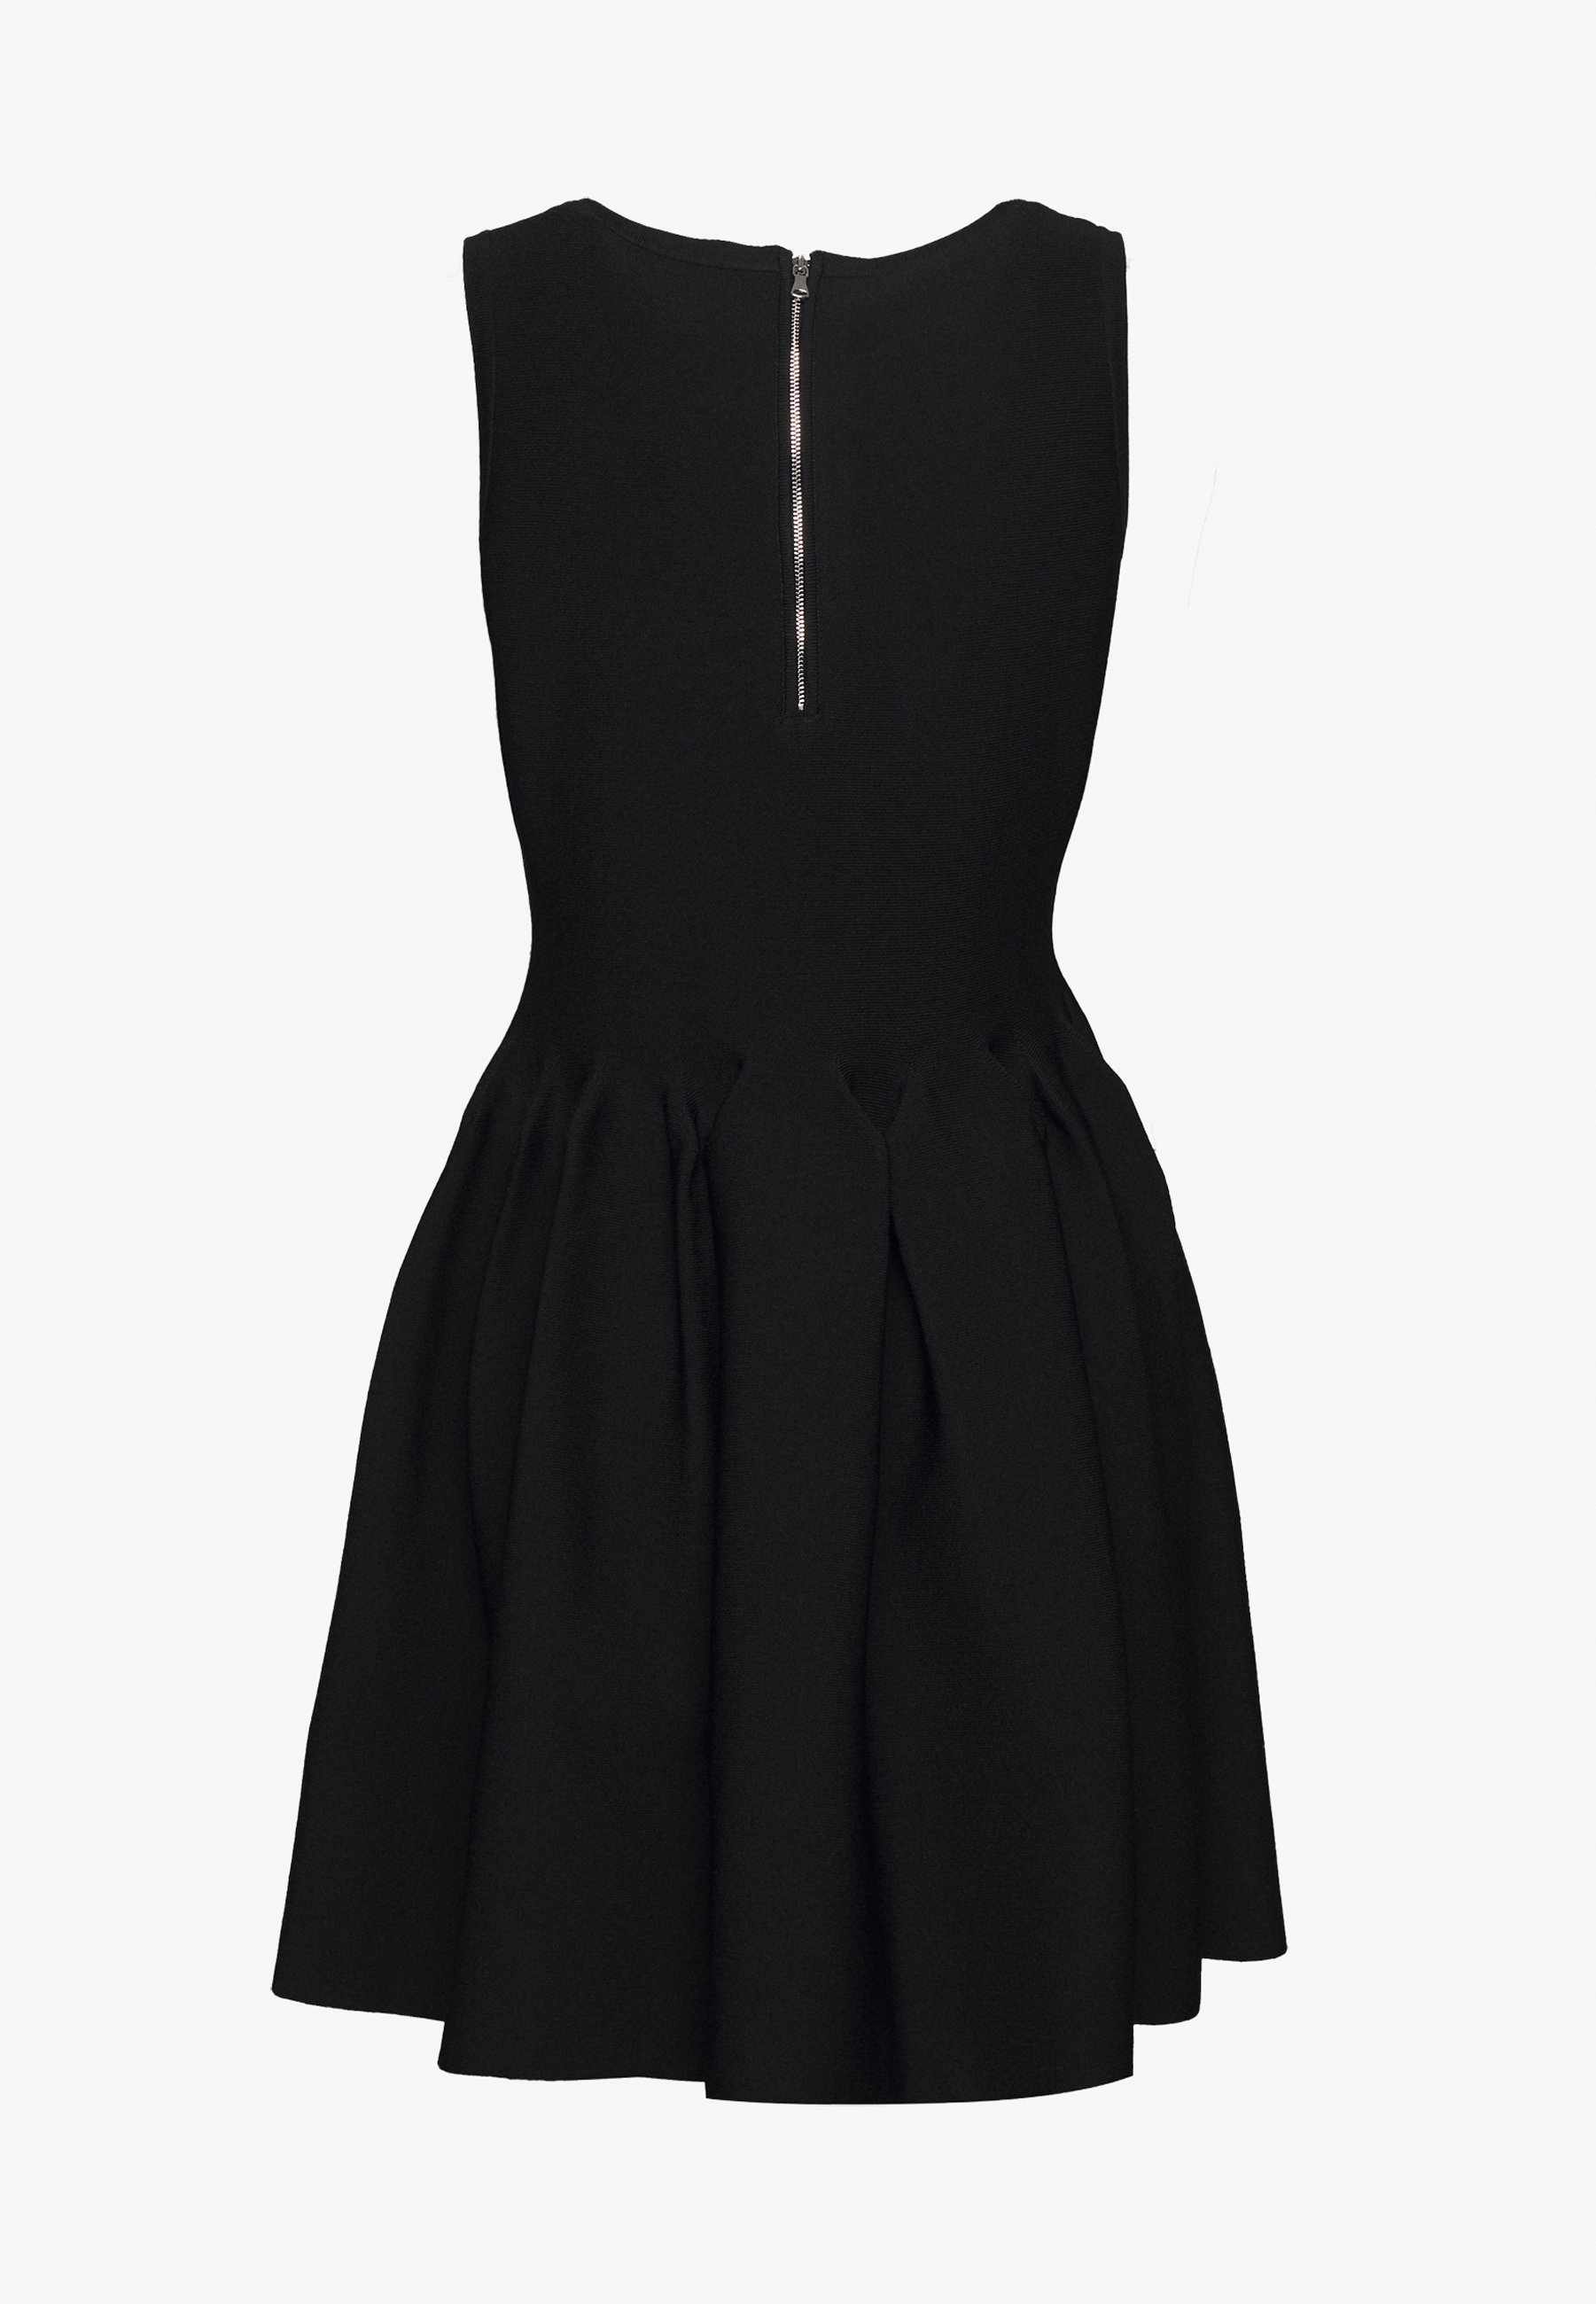 Milly Engineered Pleats Dress - Jerseyklänning Black